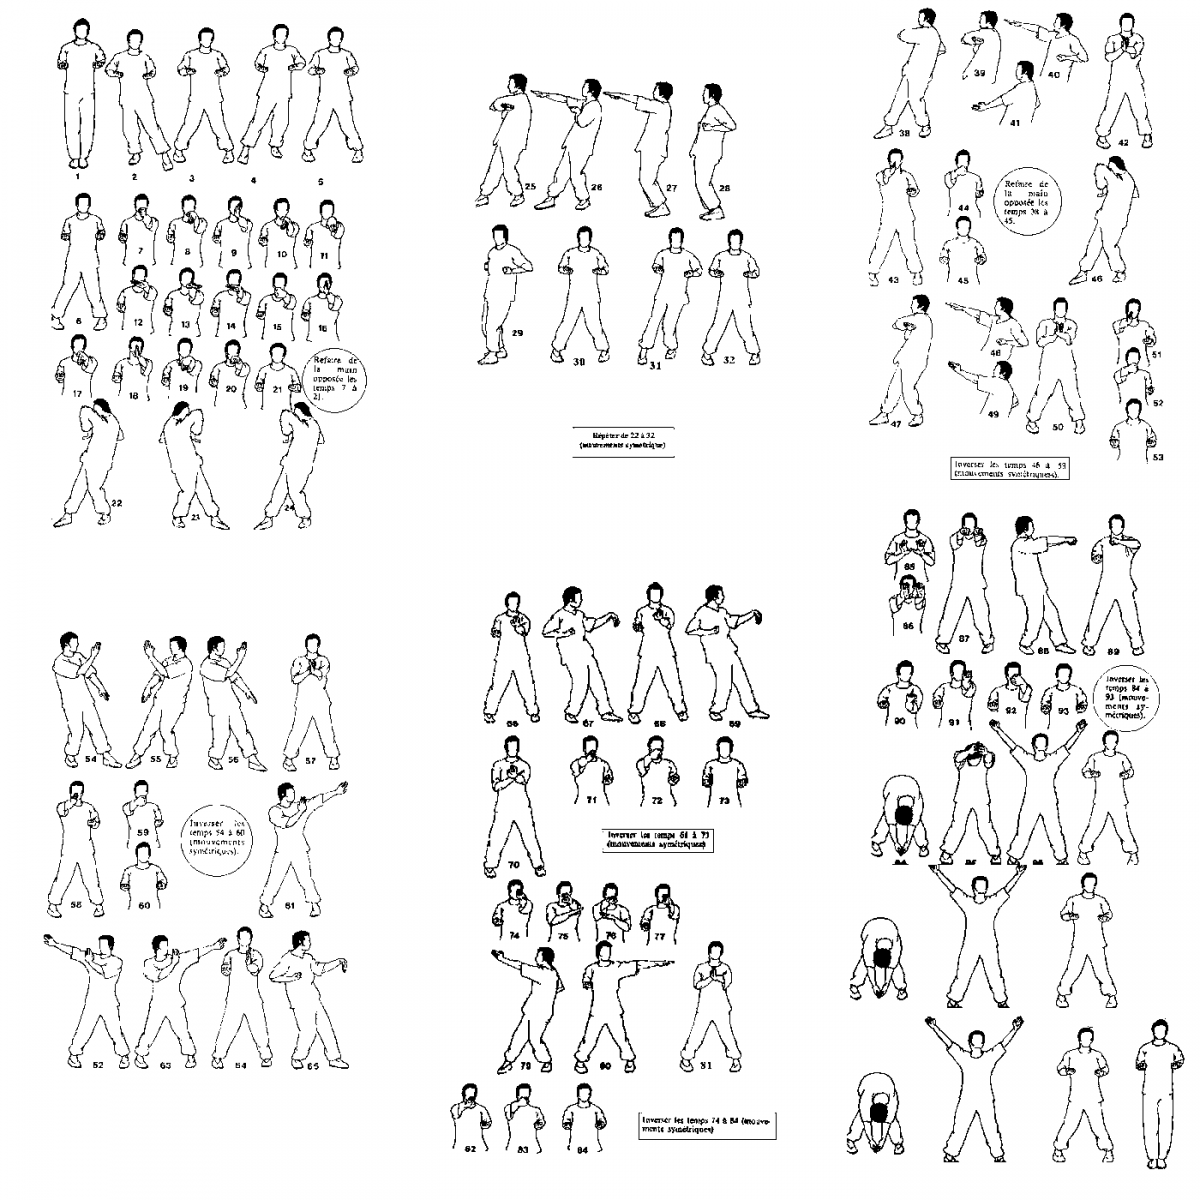 CLOSE RANGE COMBAT Wing Chun - WordPress.com